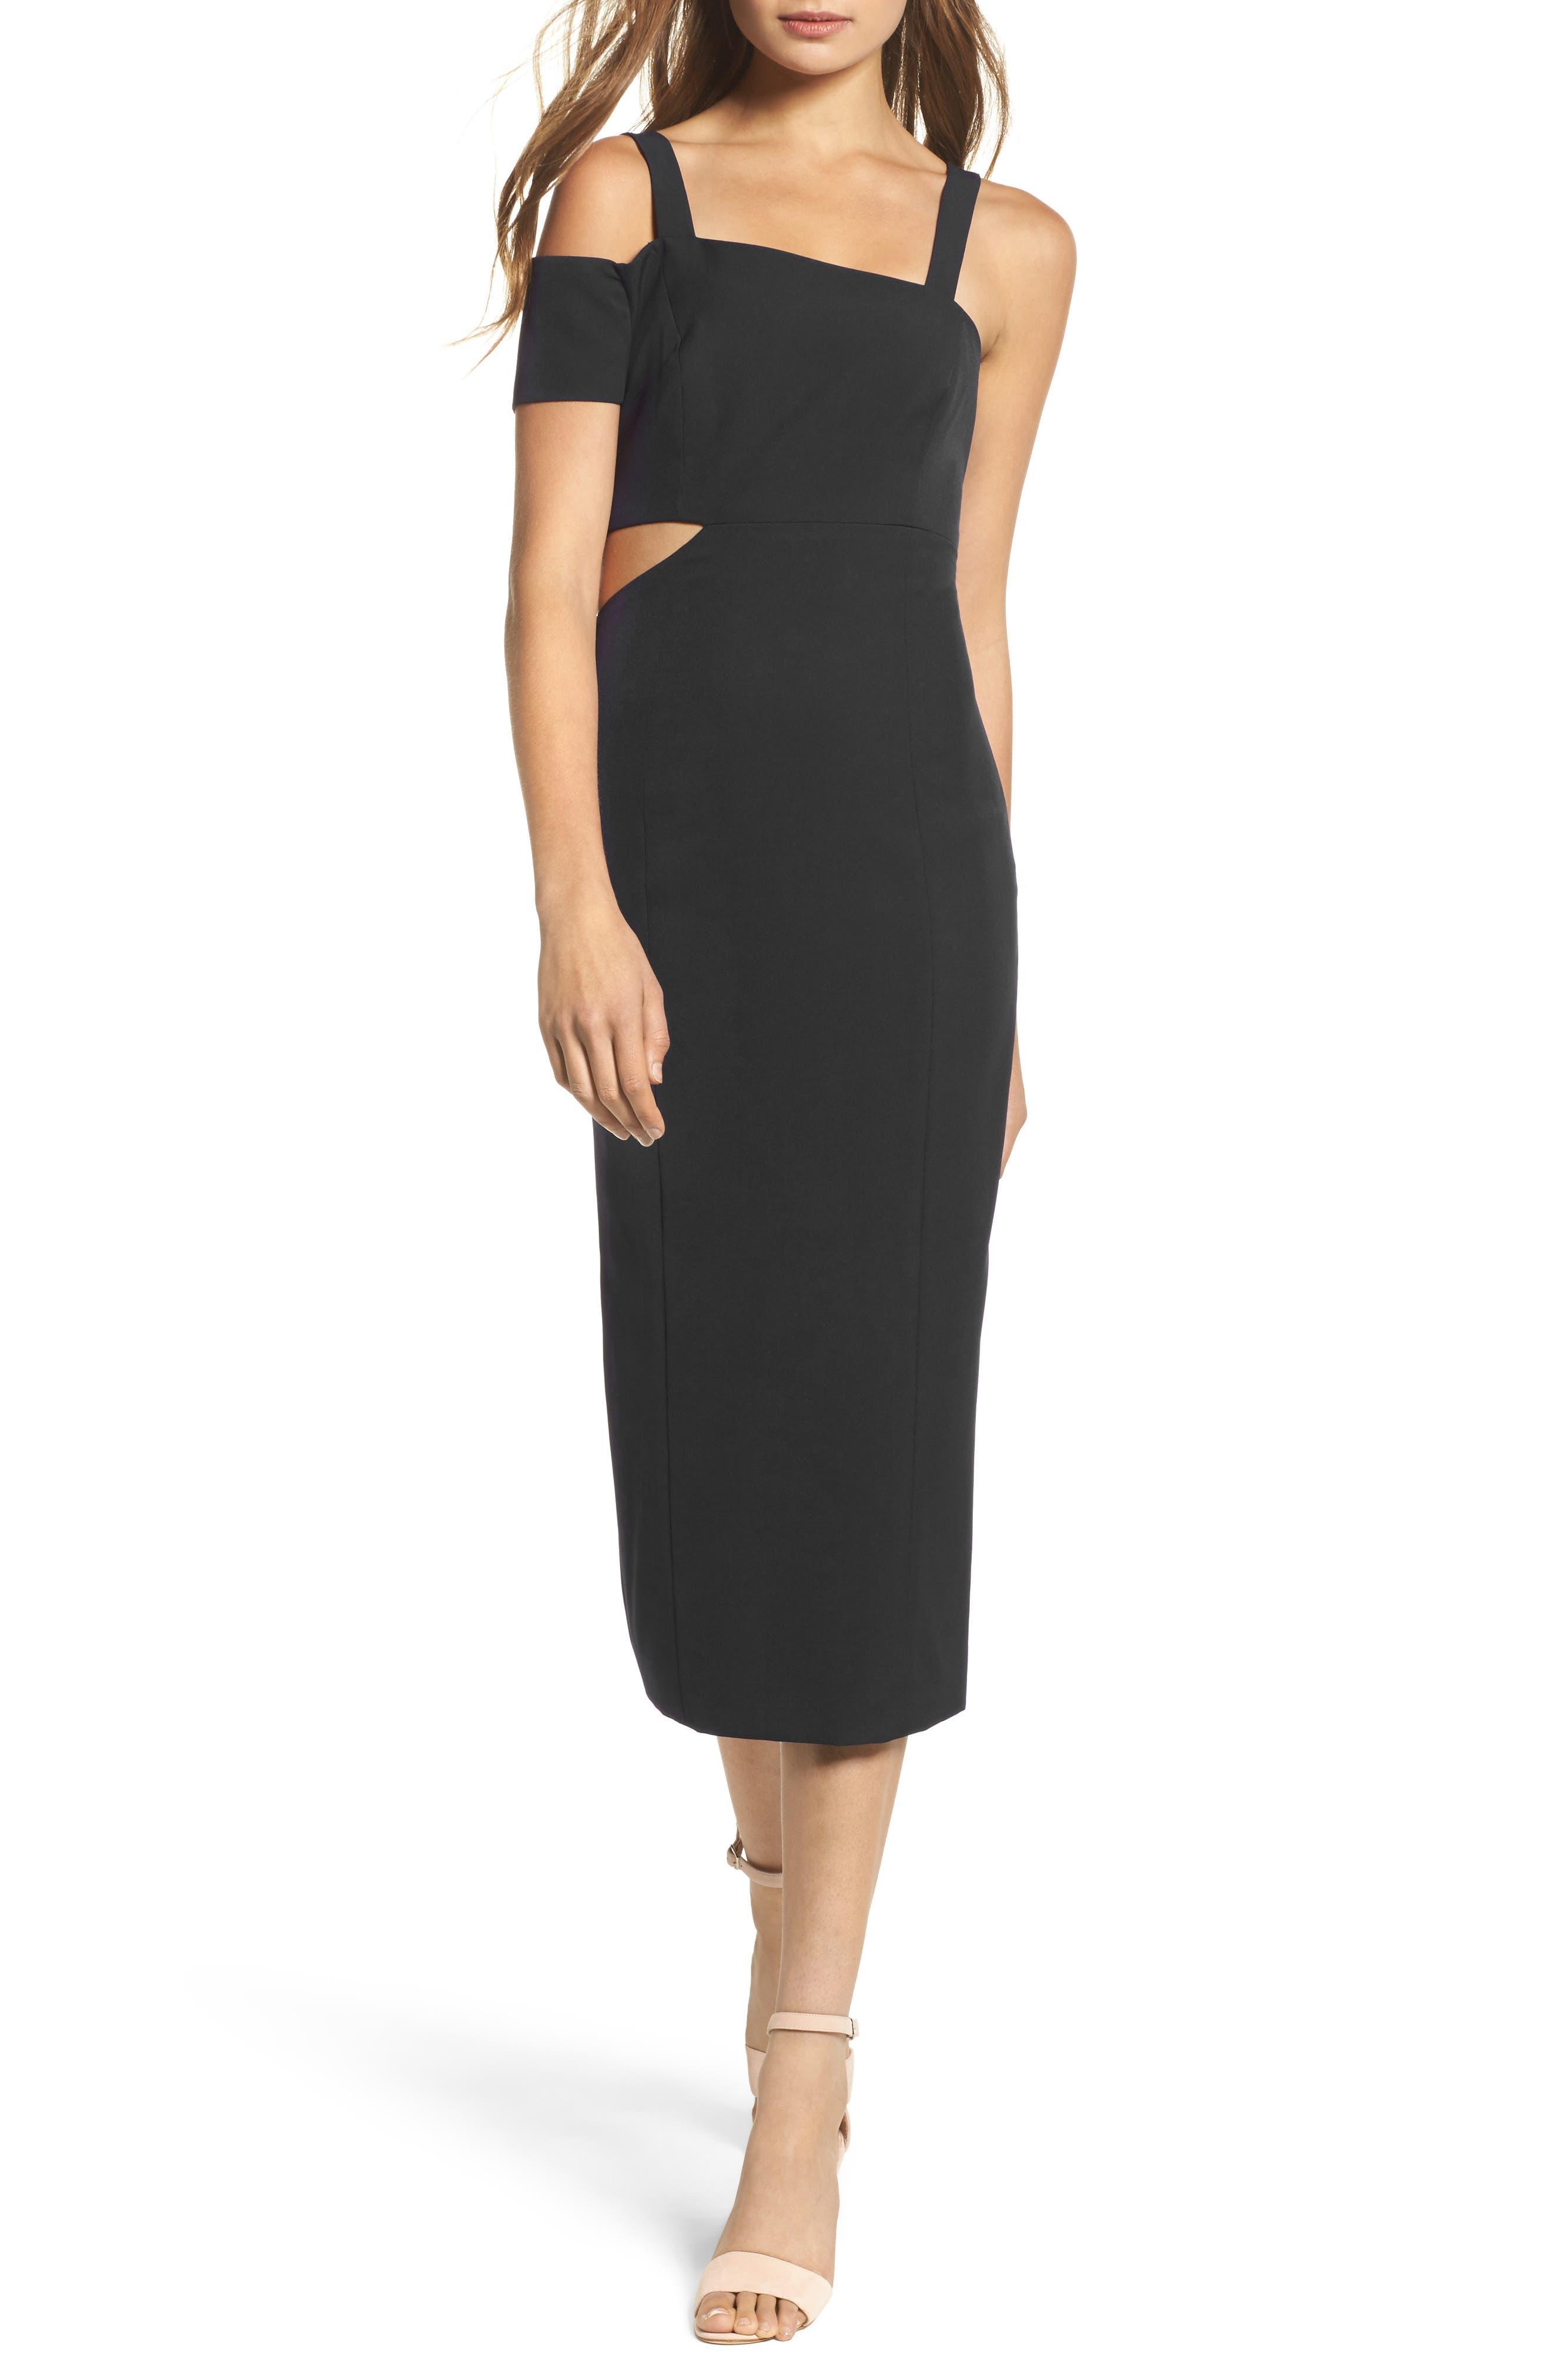 Marquette Cutout Sheath Dress,                         Main,                         color, Black